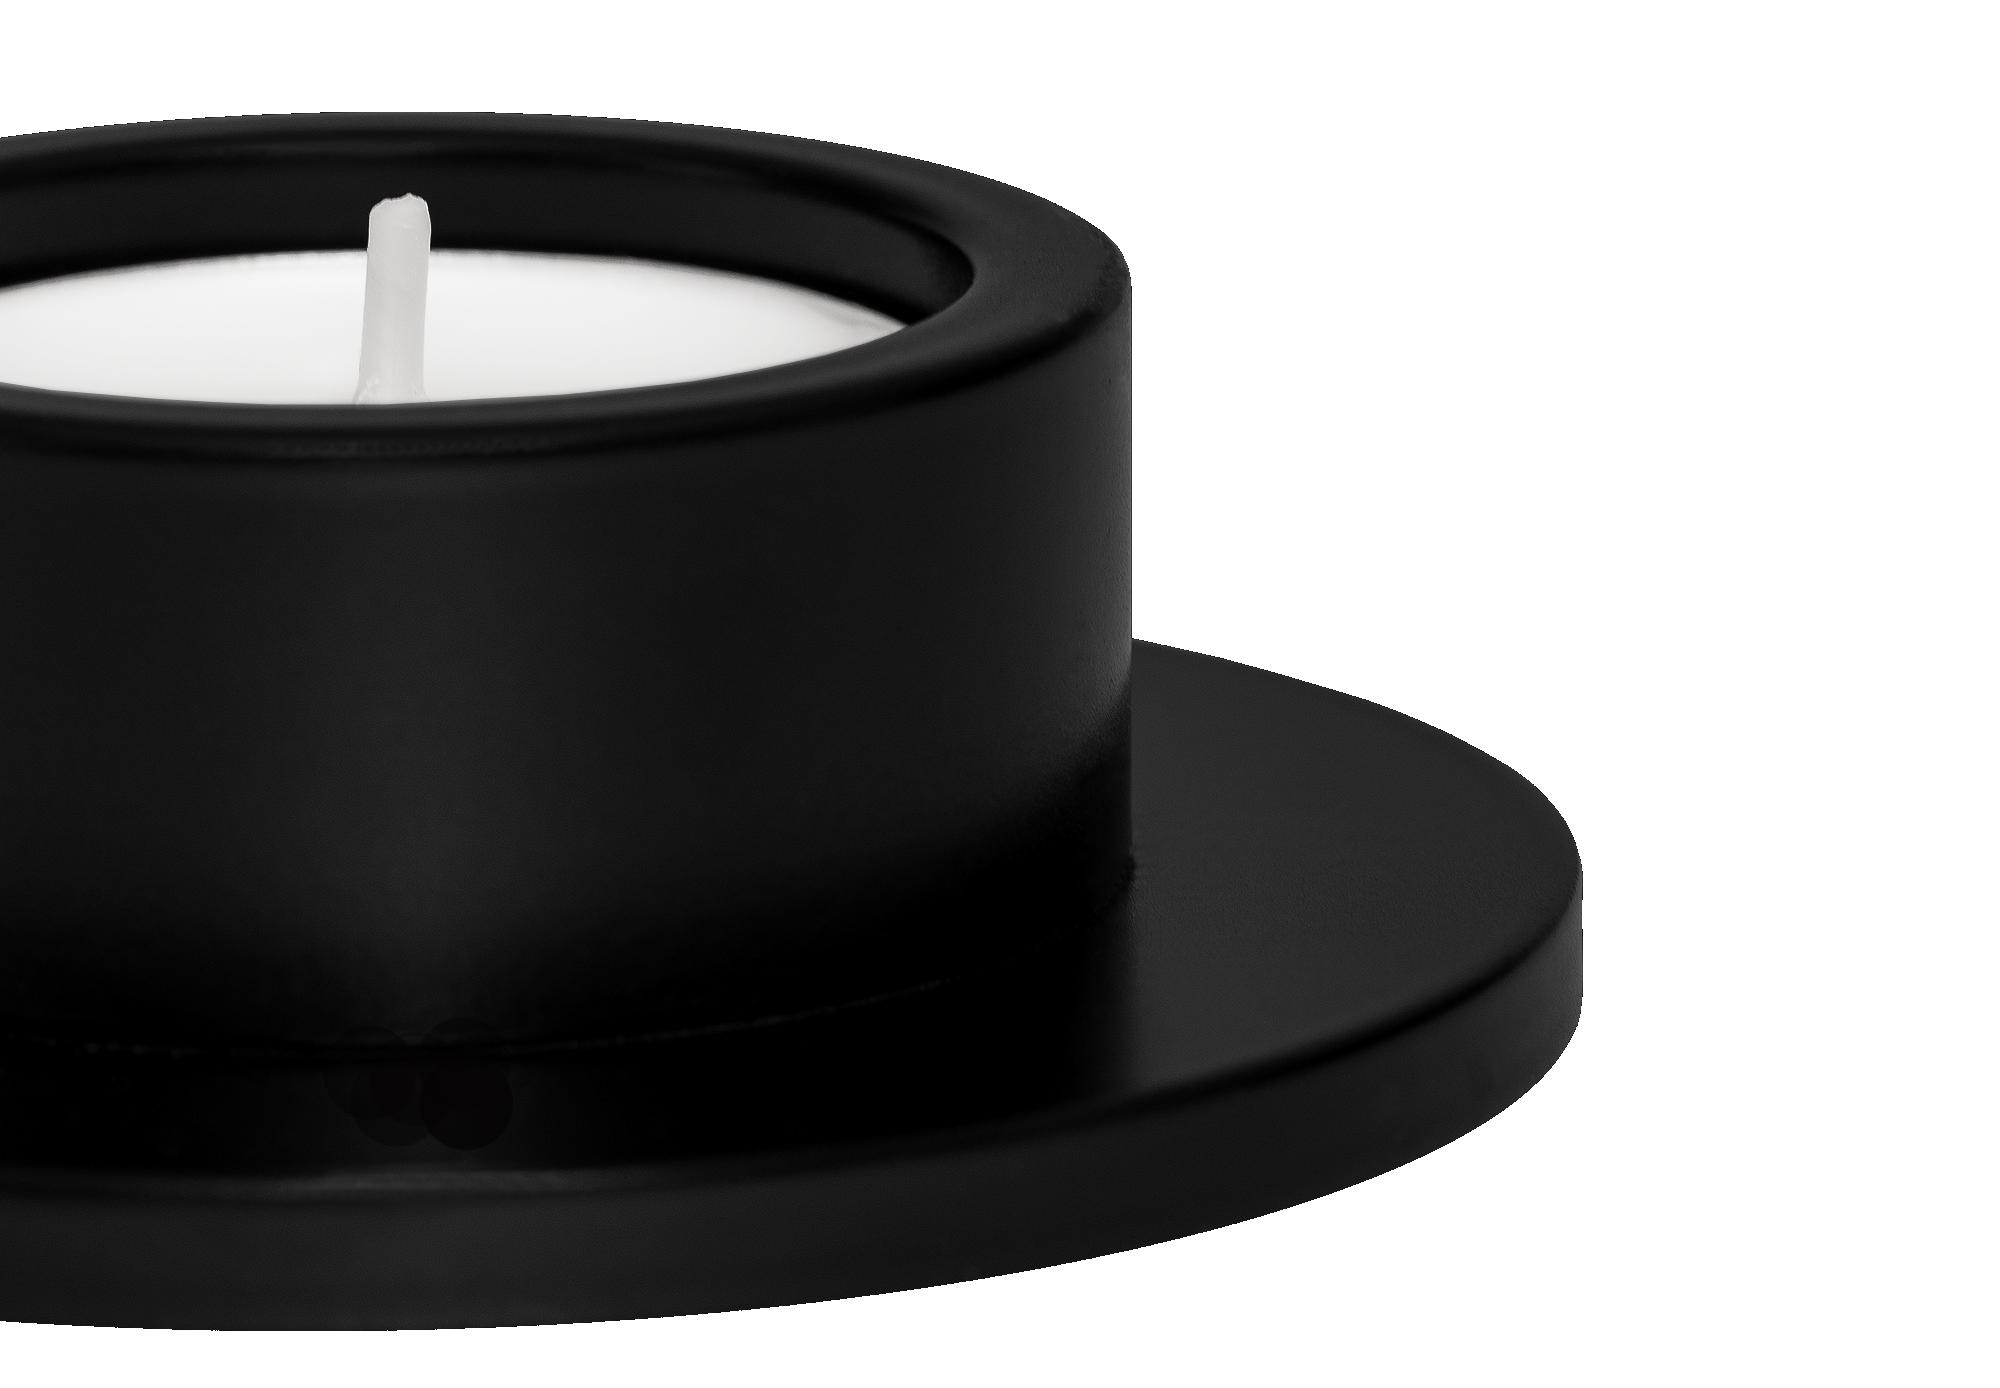 SCHMIDT / Designed by David Spinner / Candle holder close up, powder coated steel, black, size S #out #outgermany #candleholder #kerzenständer #accessoire #powdercoated #pulverbeschichtet #objekteunserertage #decoration